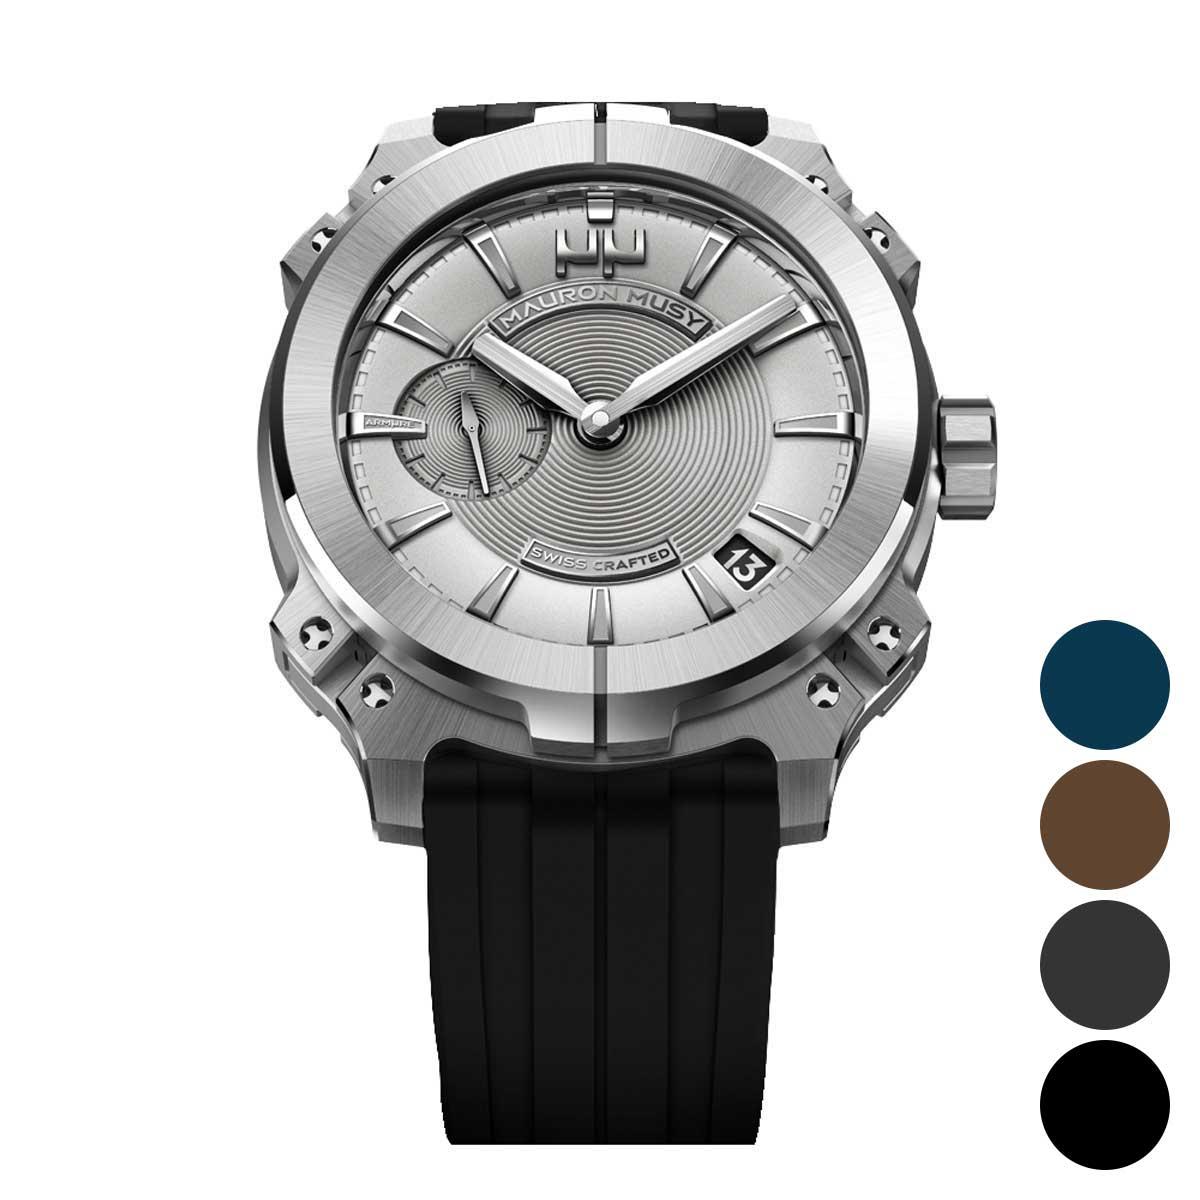 MAURON MUSY モーロン・ミュジー 自動巻き 腕時計 [MU03-106] デイト